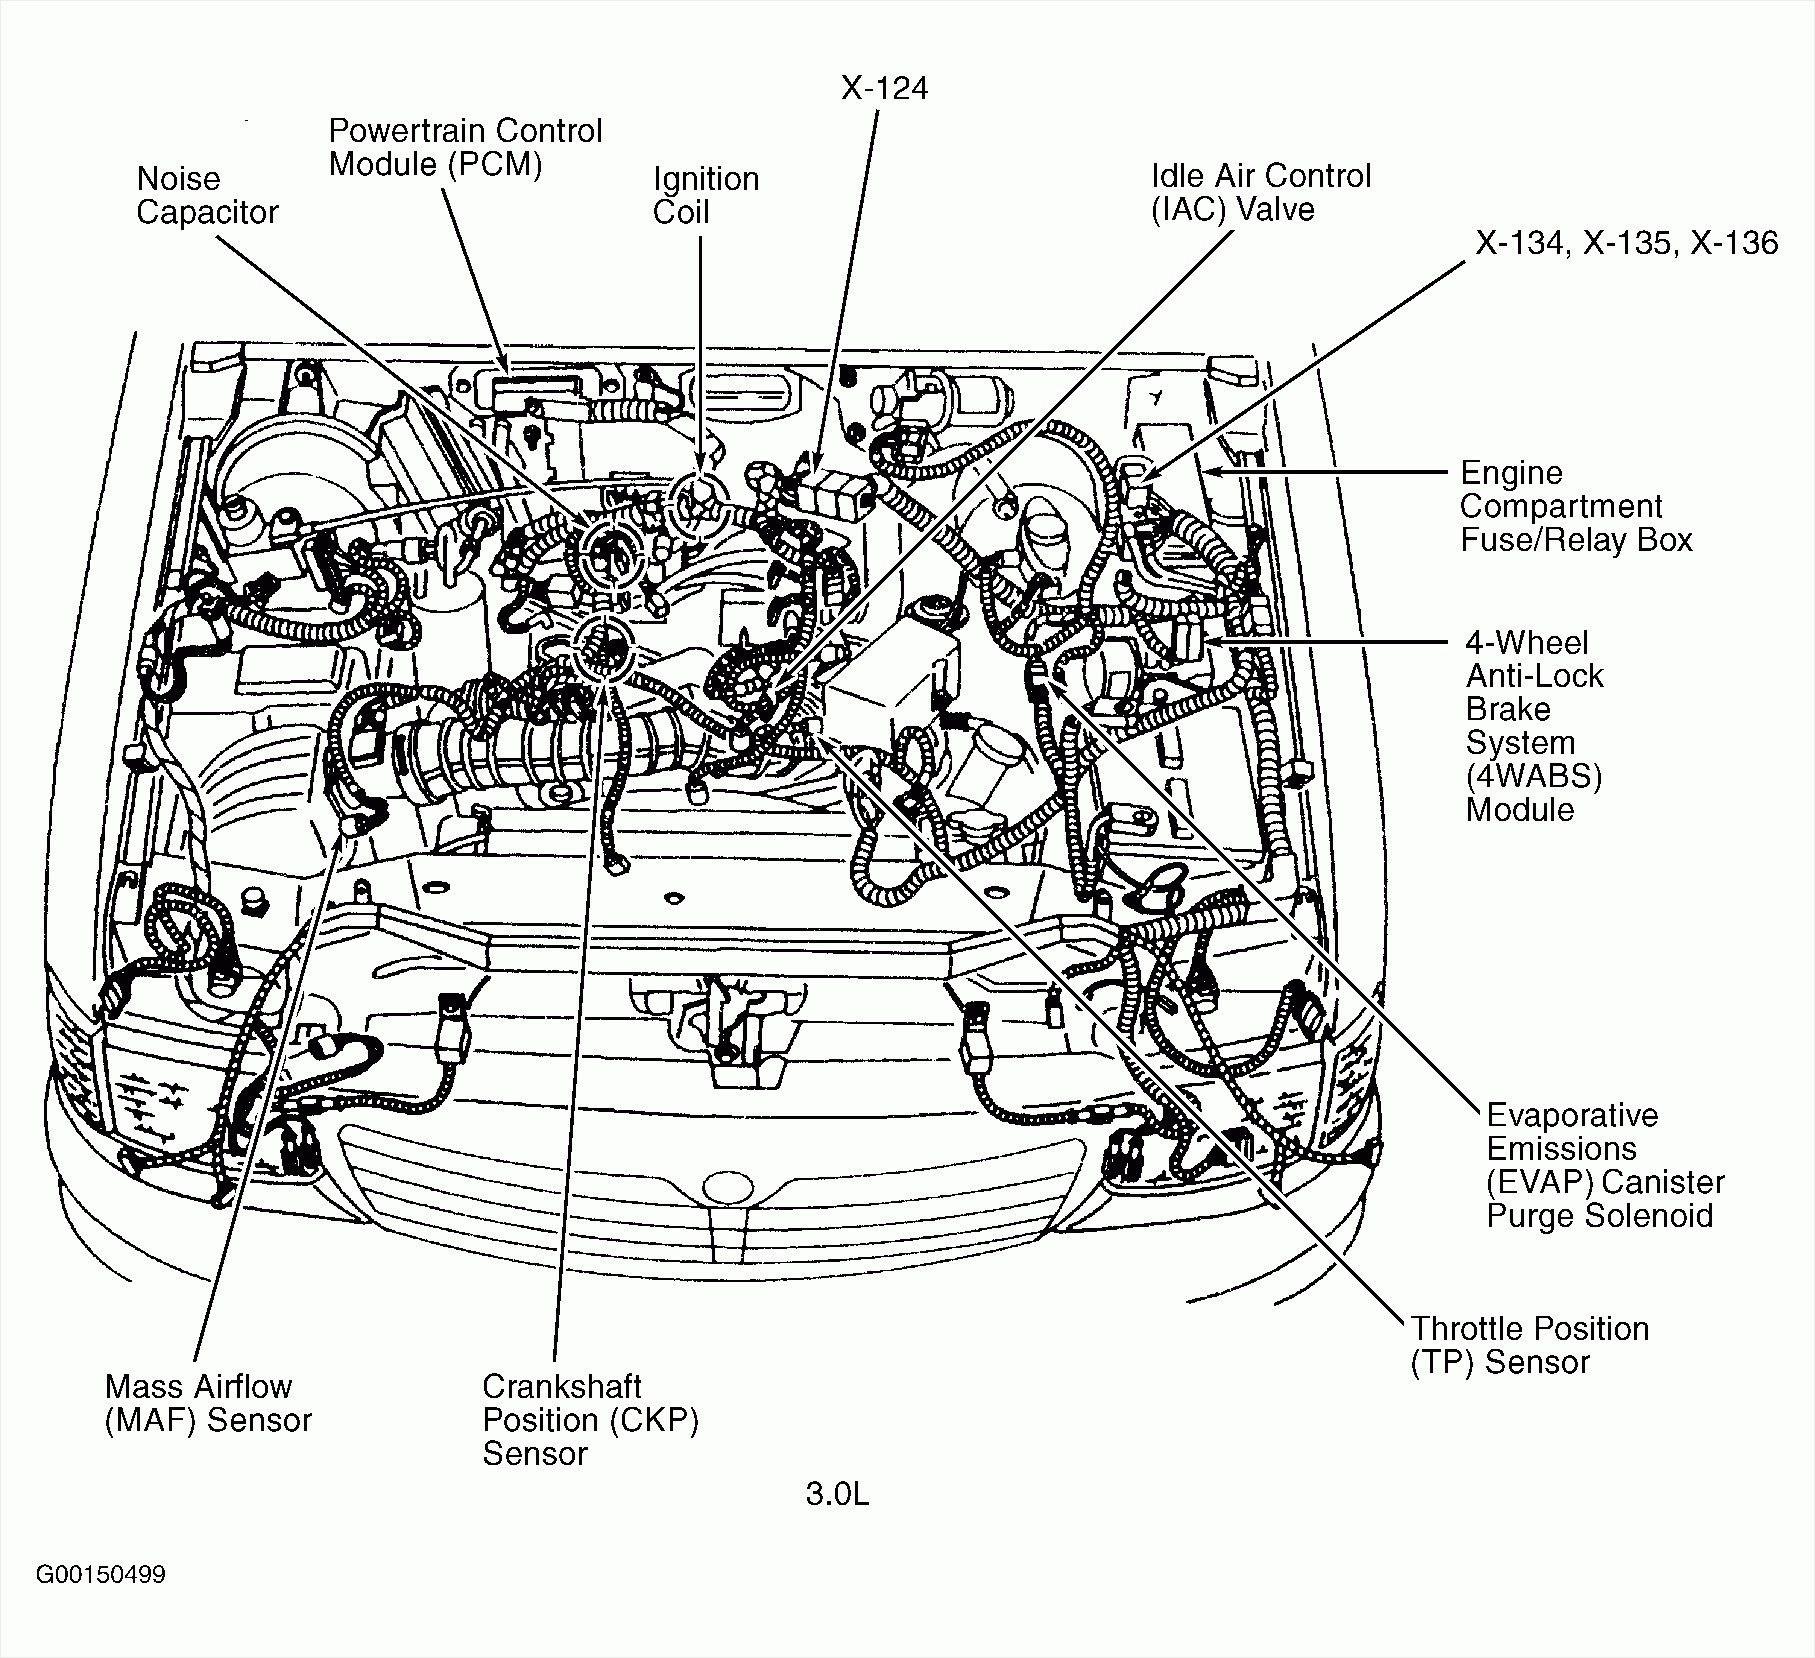 [DIAGRAM_0HG]  Vw Jetta Engine Diagram - Wiring Diagrams | Vw Golf 2 0 Engine Diagram |  | karox.fr